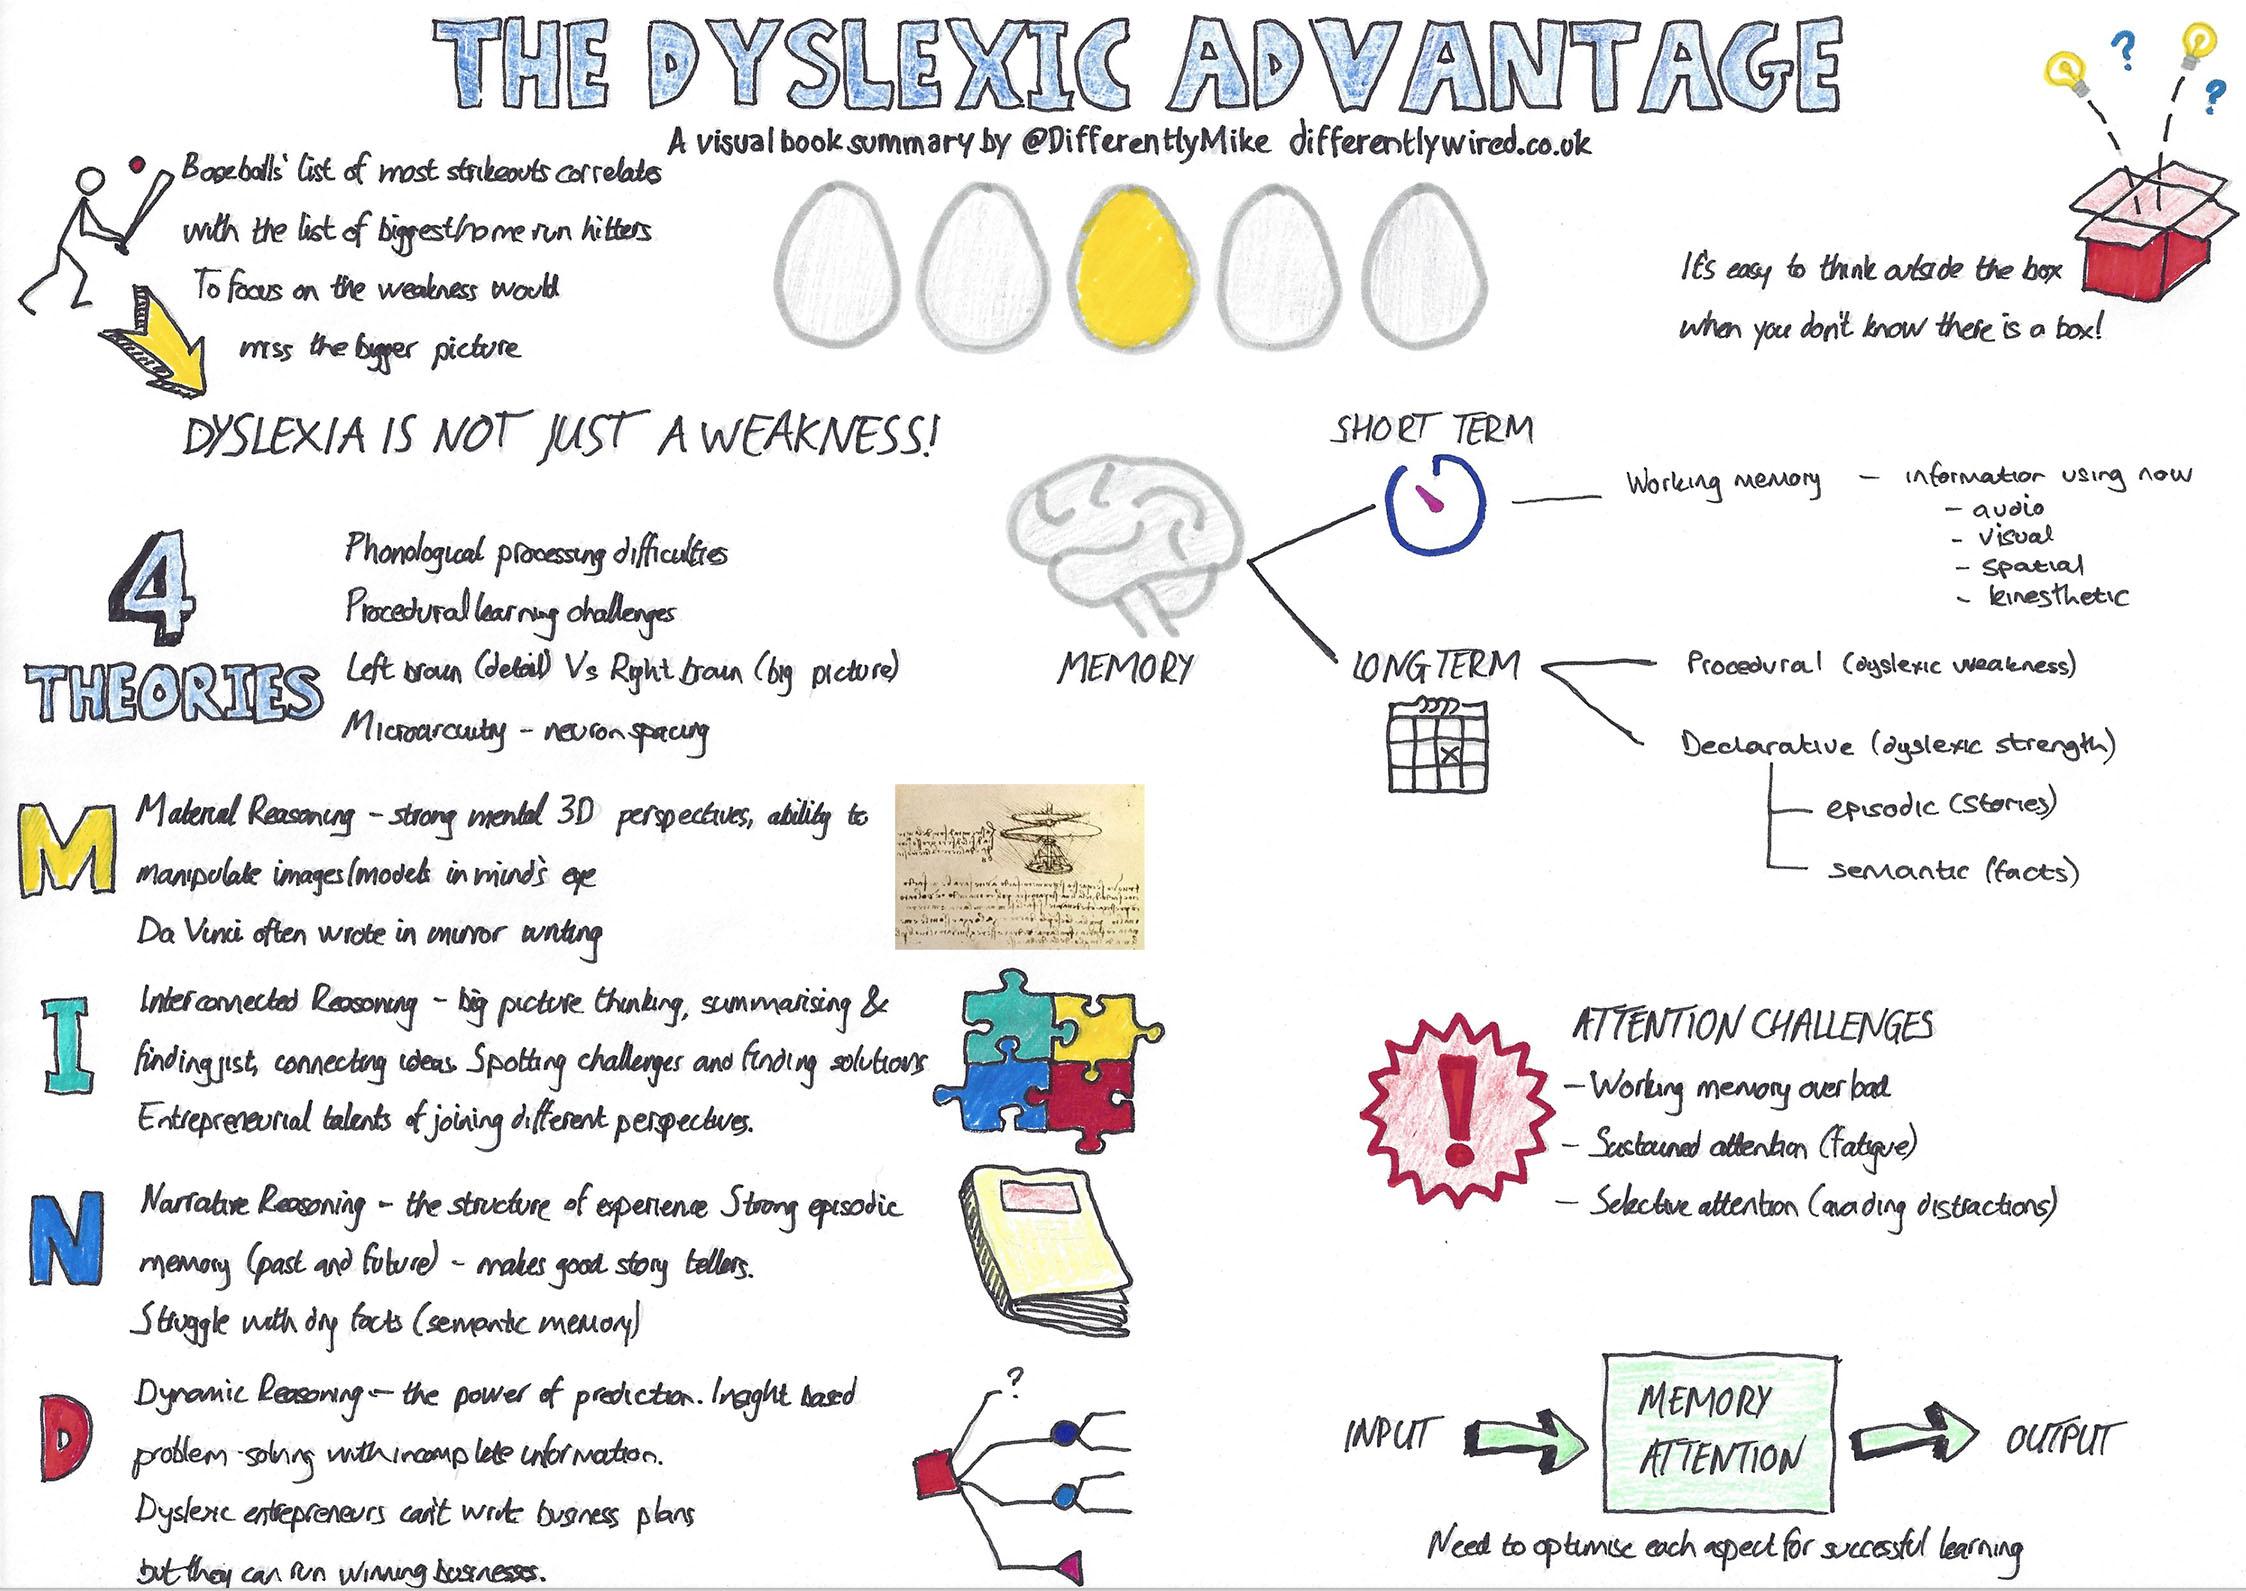 dyslexic advantage visual book summary ook summary sml